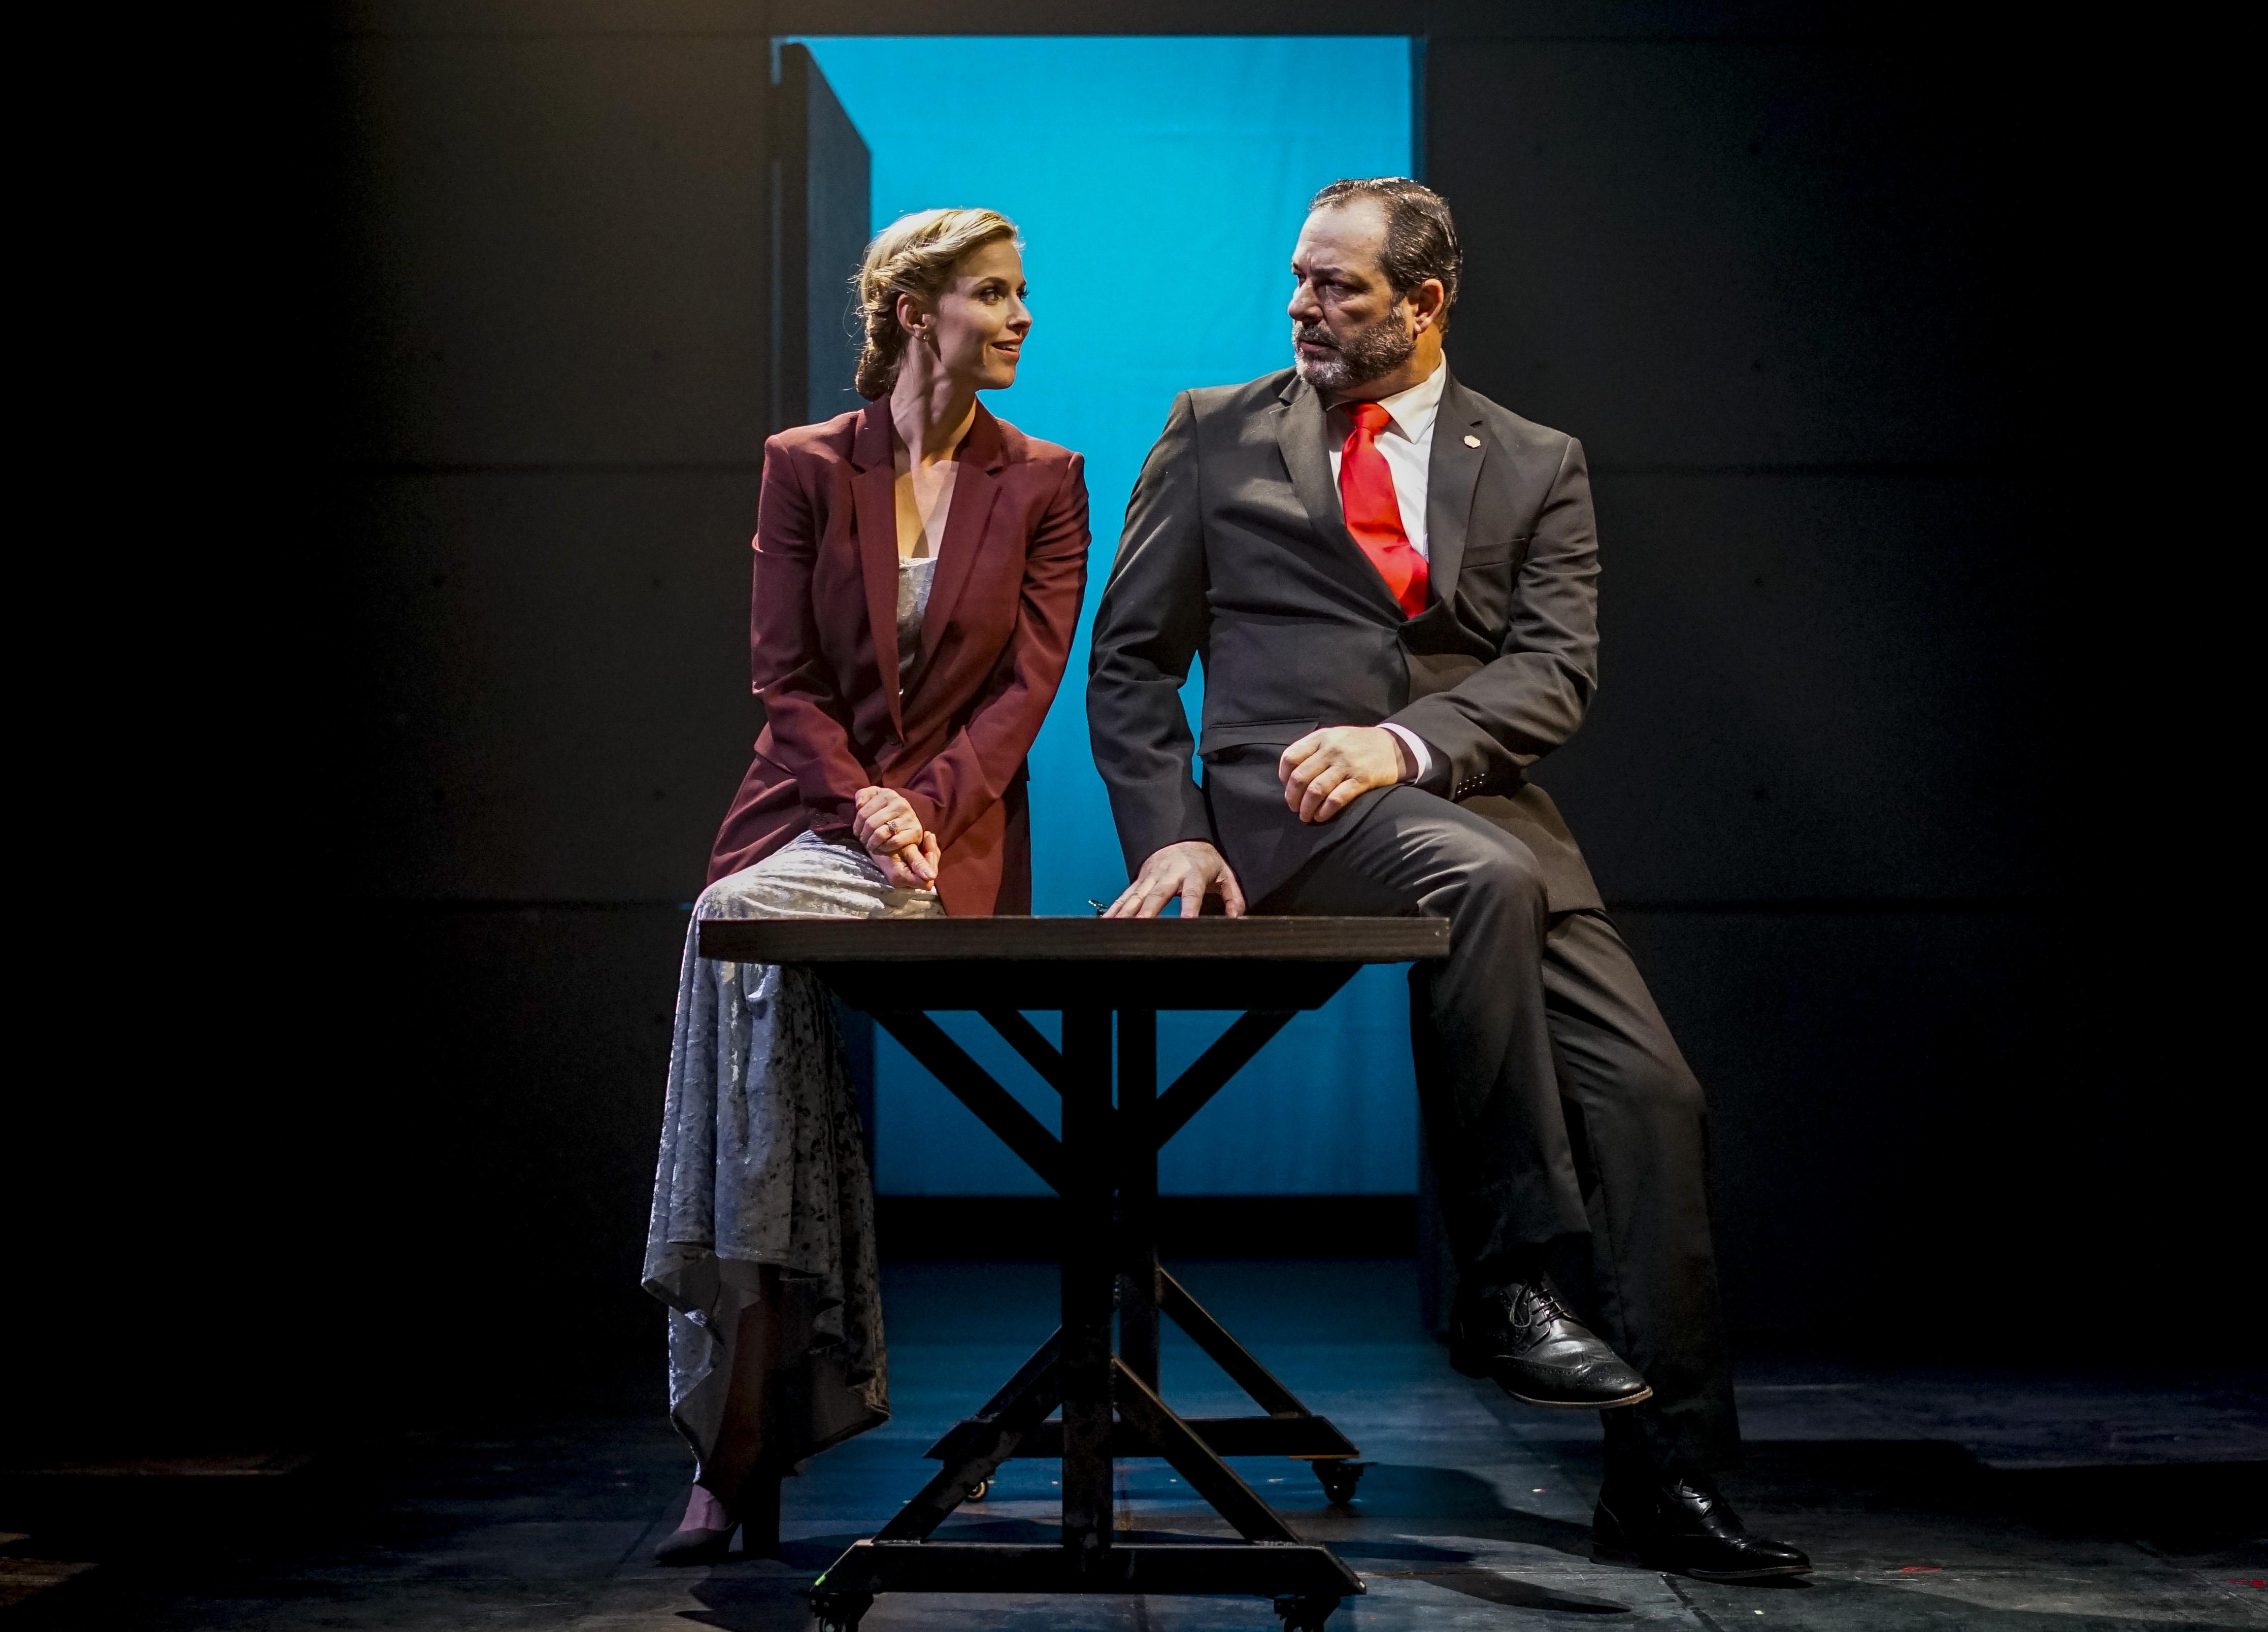 Allison Spratt Pearce (Kate) and Manny Fernandes (Henry). Photo by Darren Scott.